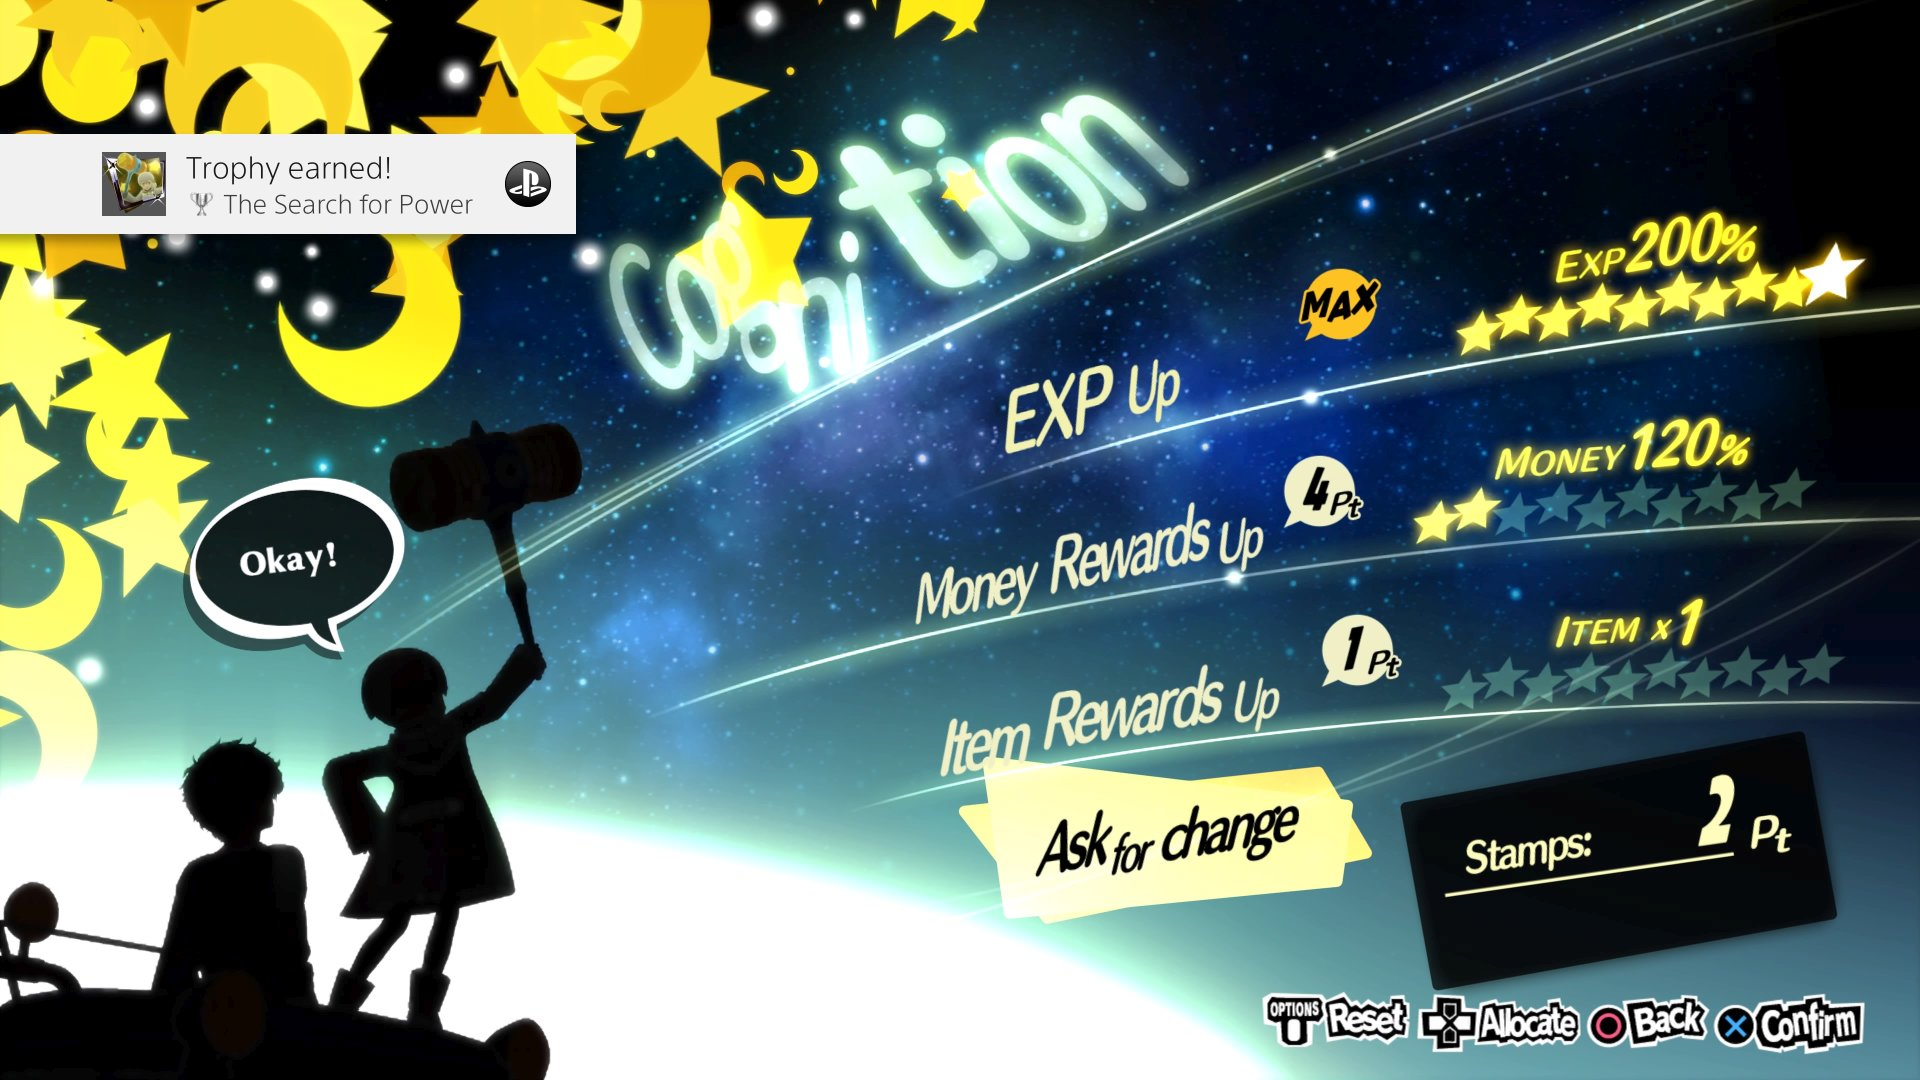 Persona 5 Royal - PS4 - Recenzja Gry - rascal.pl - Jose